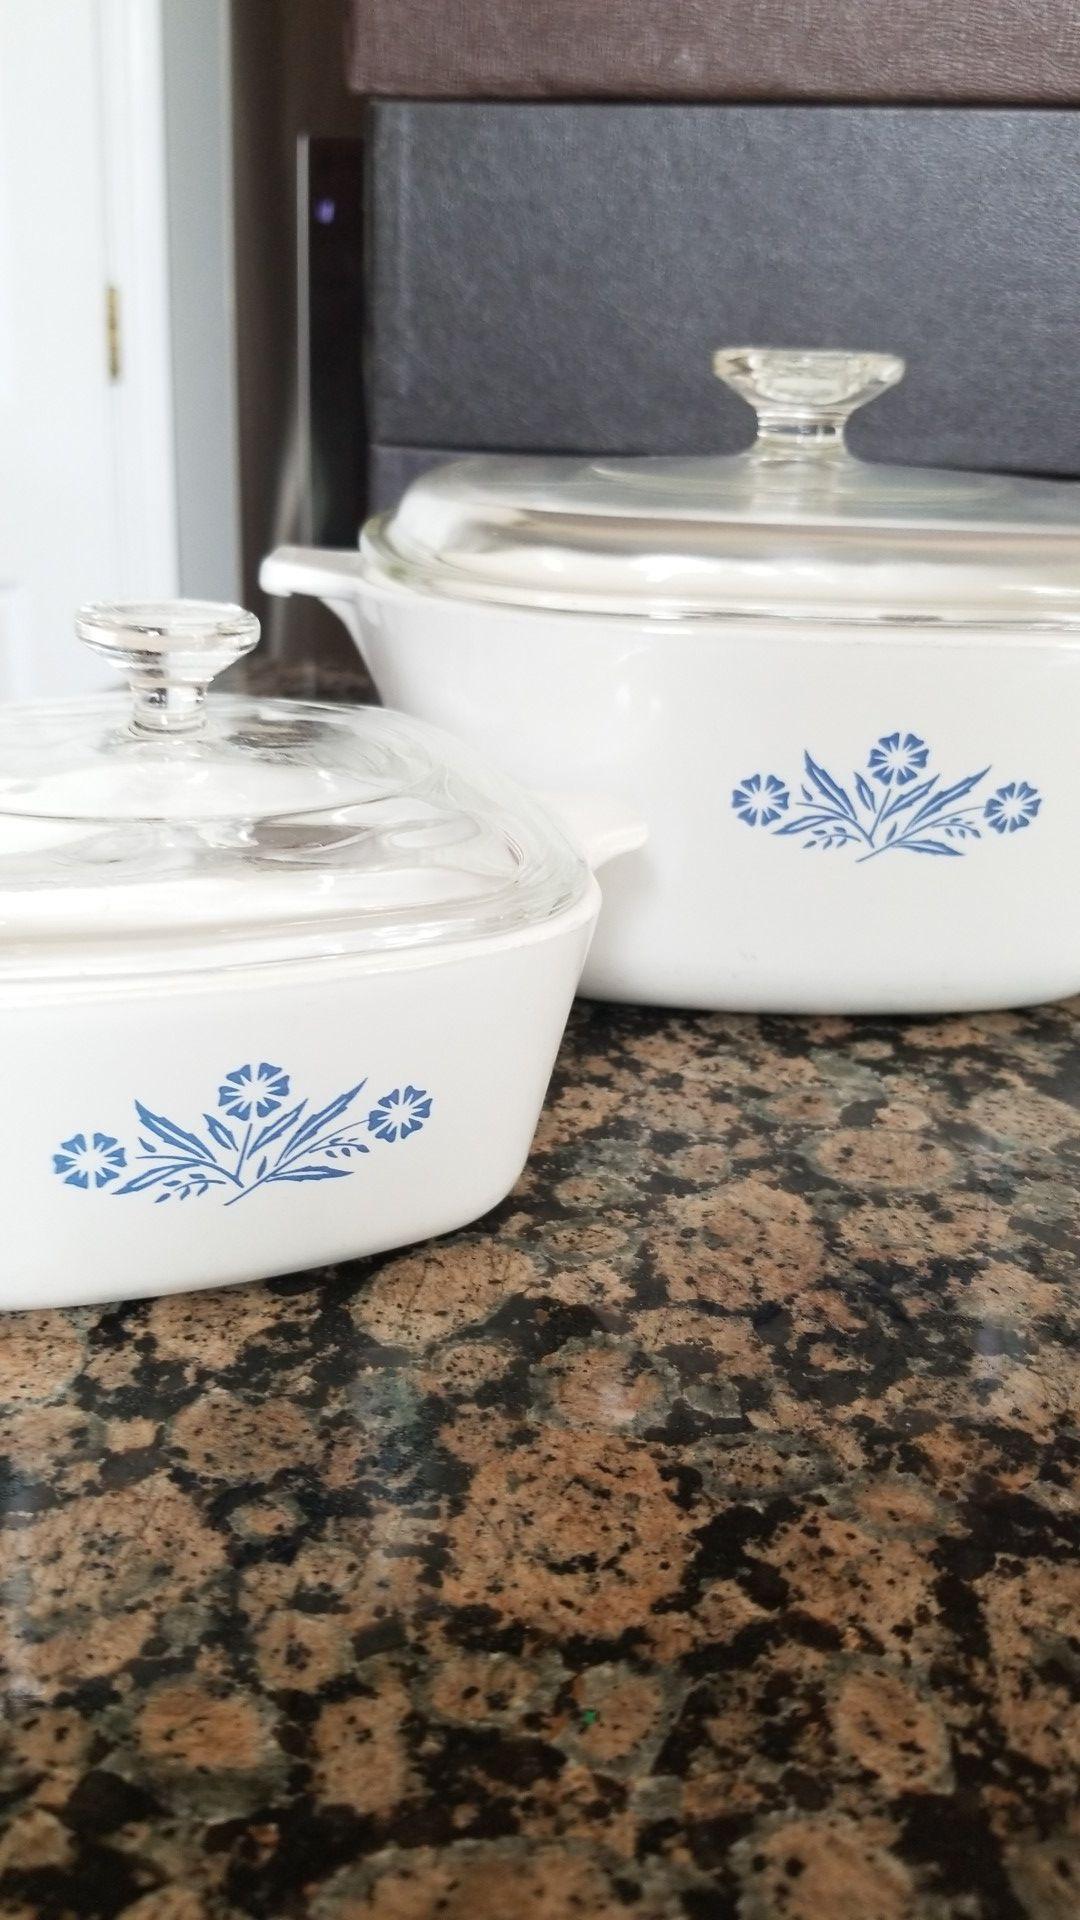 2-piece Corningware set